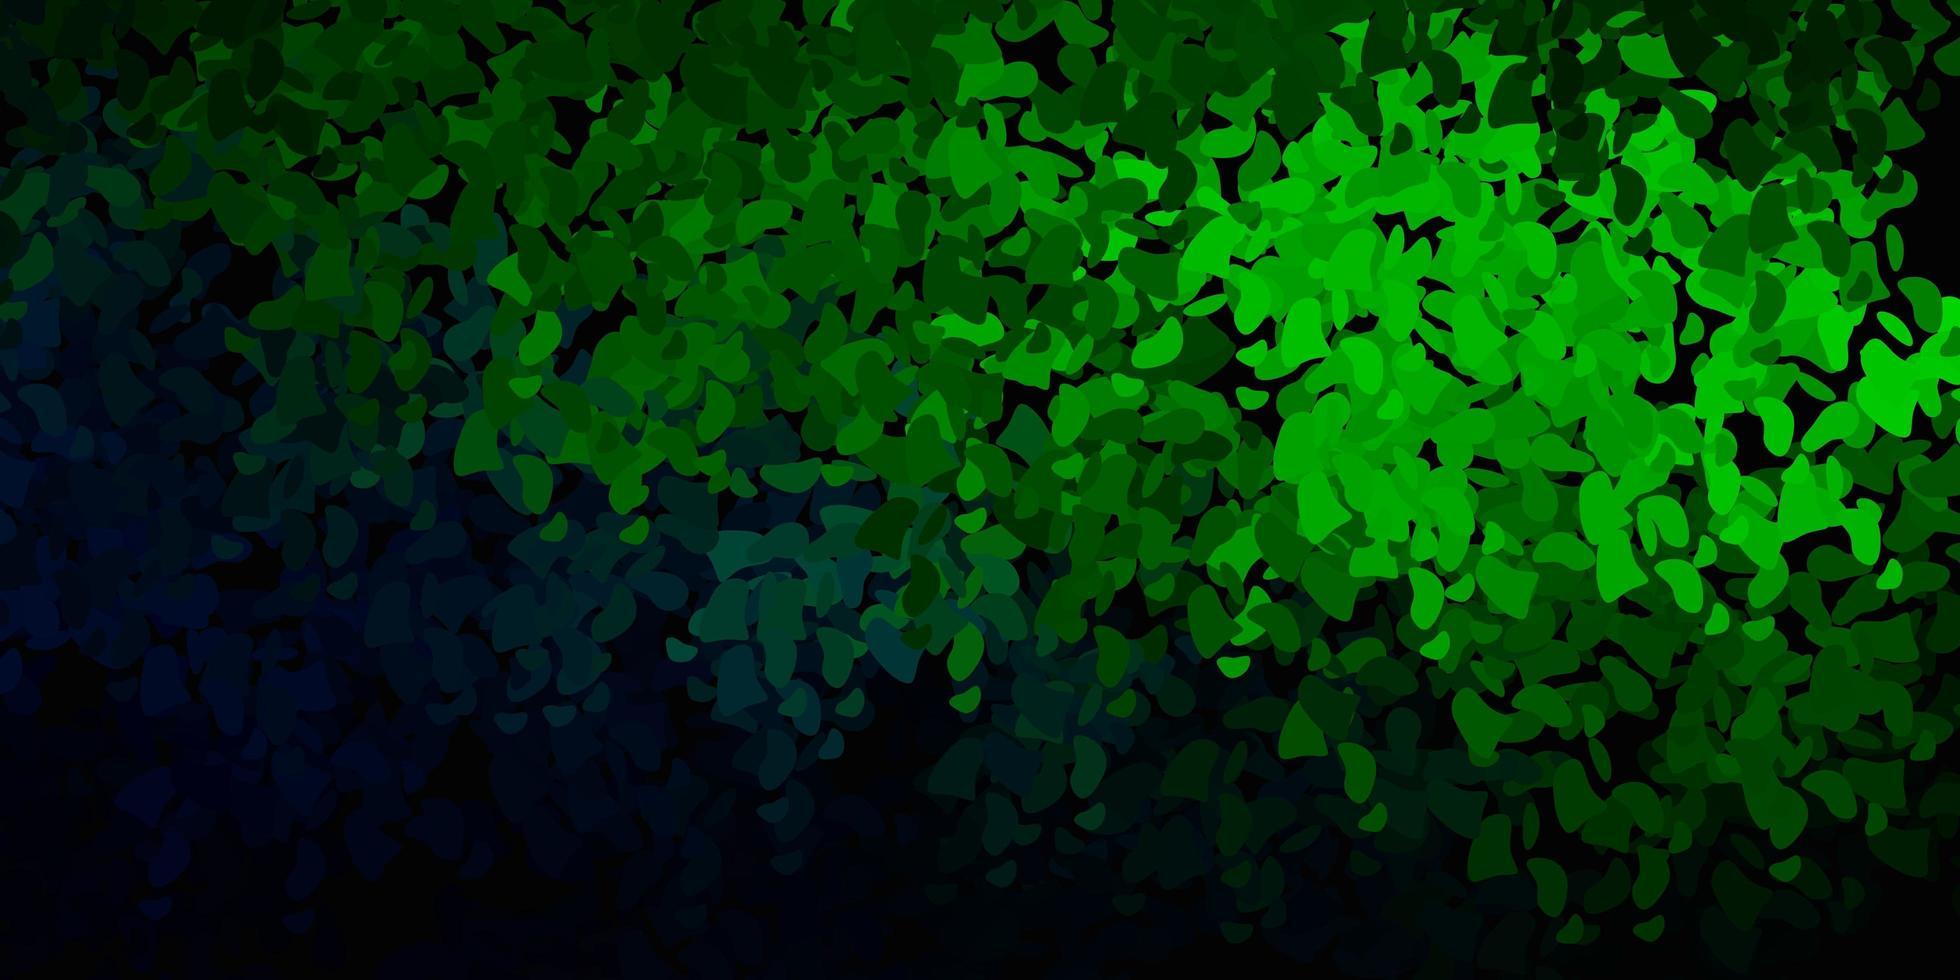 textura vector verde escuro com formas de memphis.